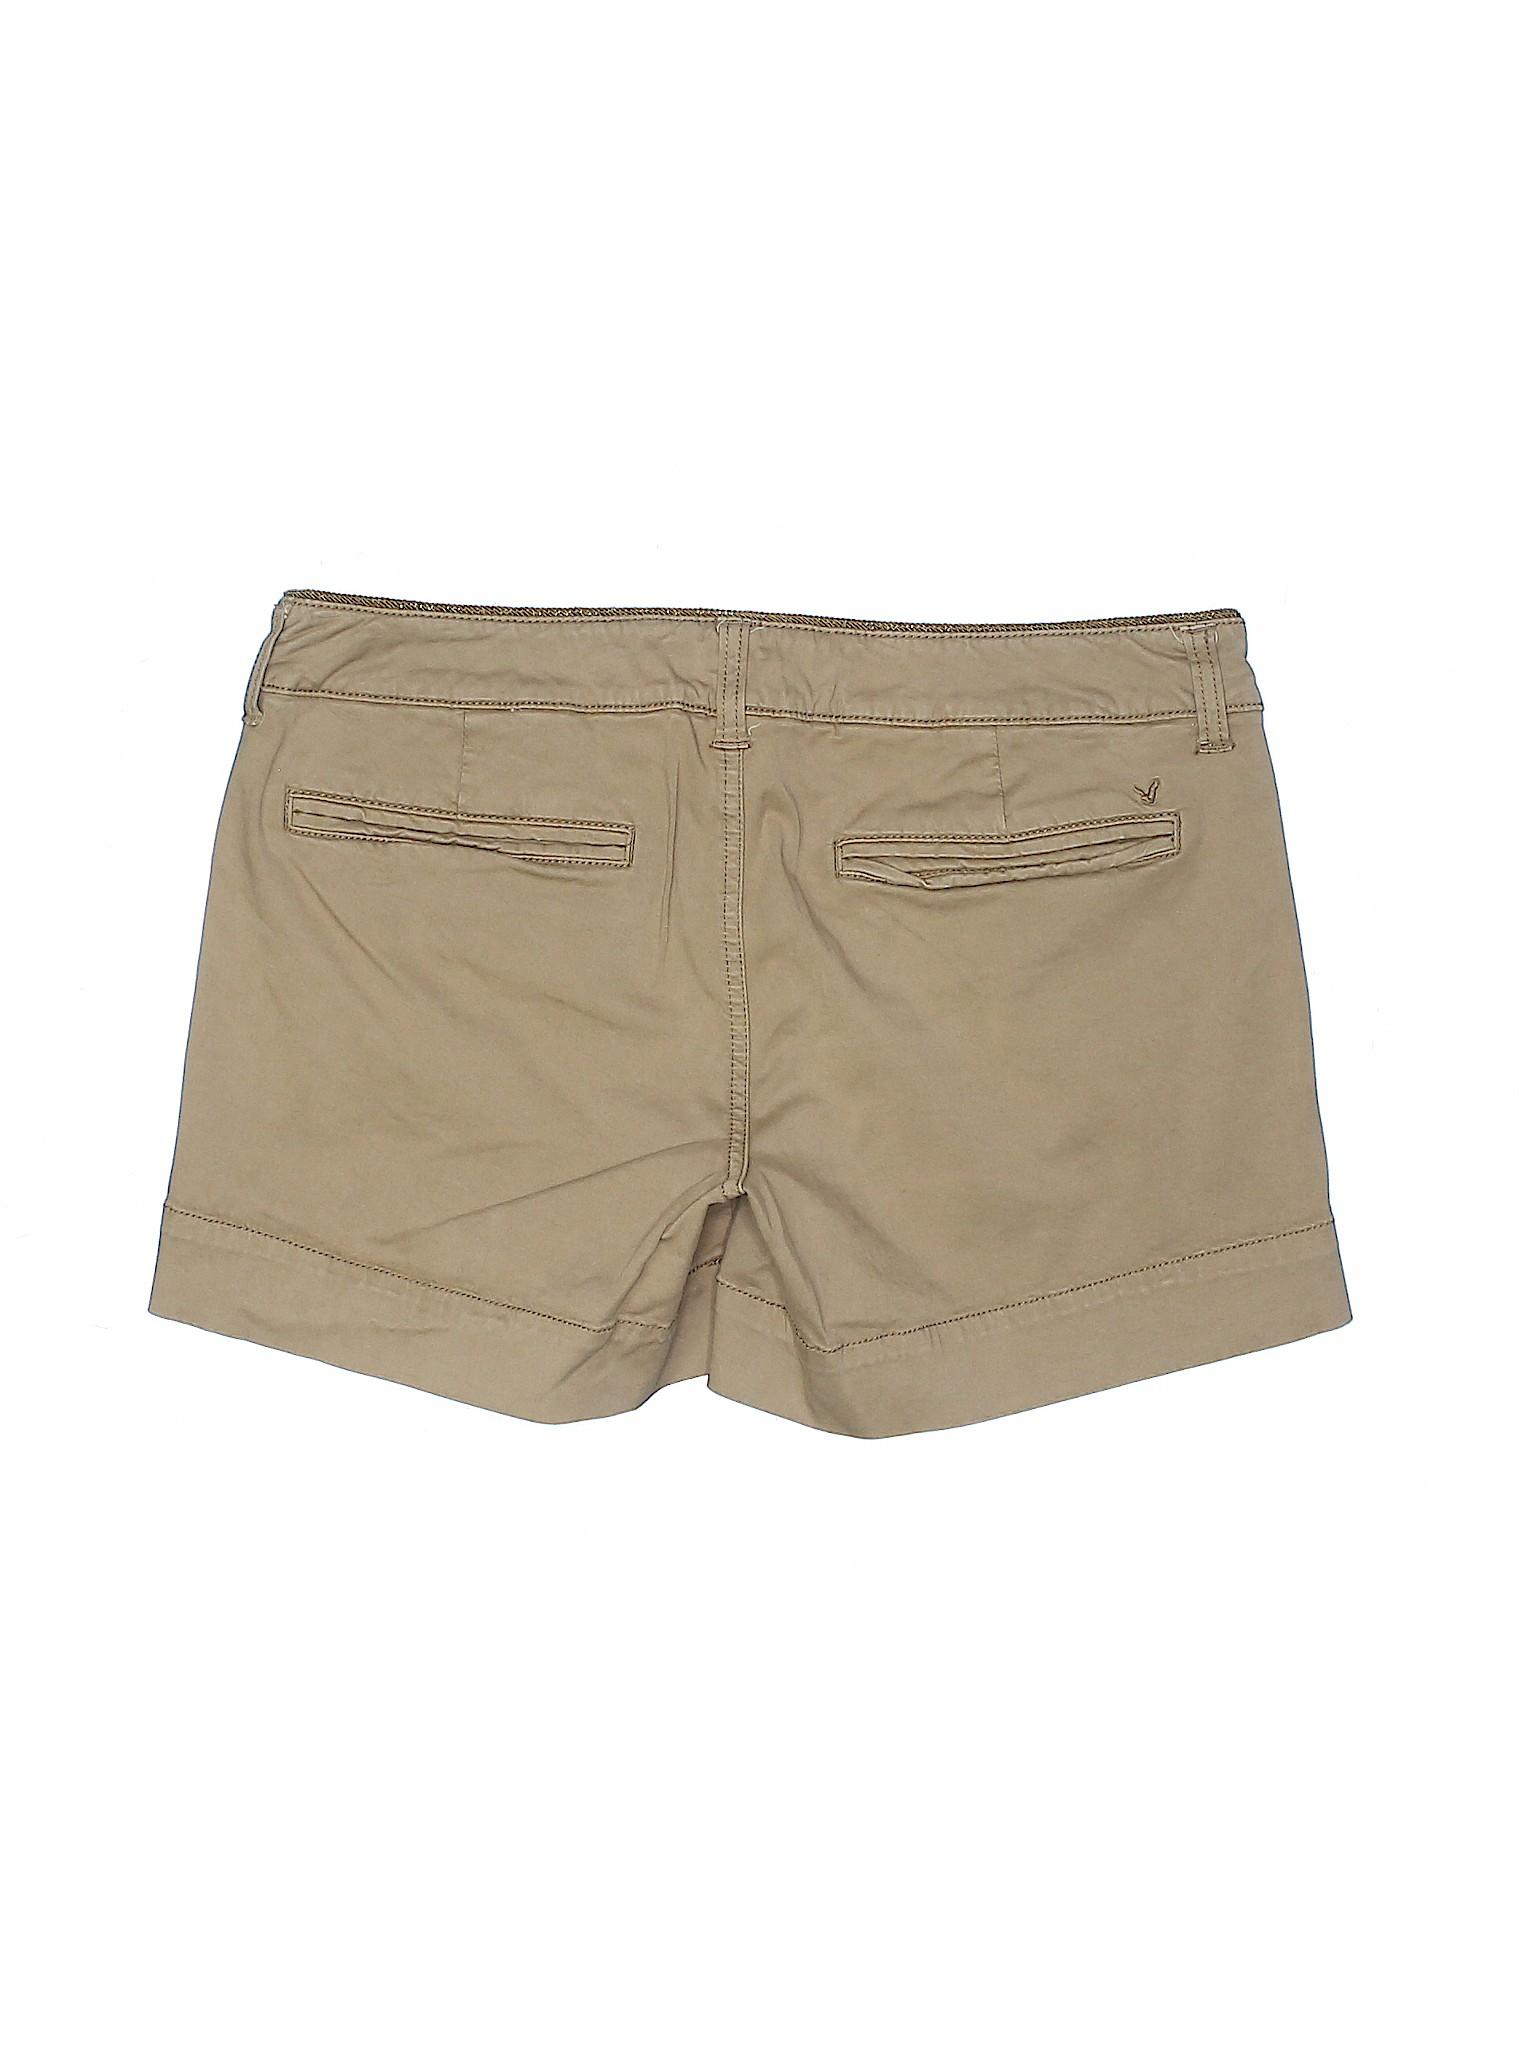 Shorts Khaki Boutique Outfitters Eagle American q0xnwAHz